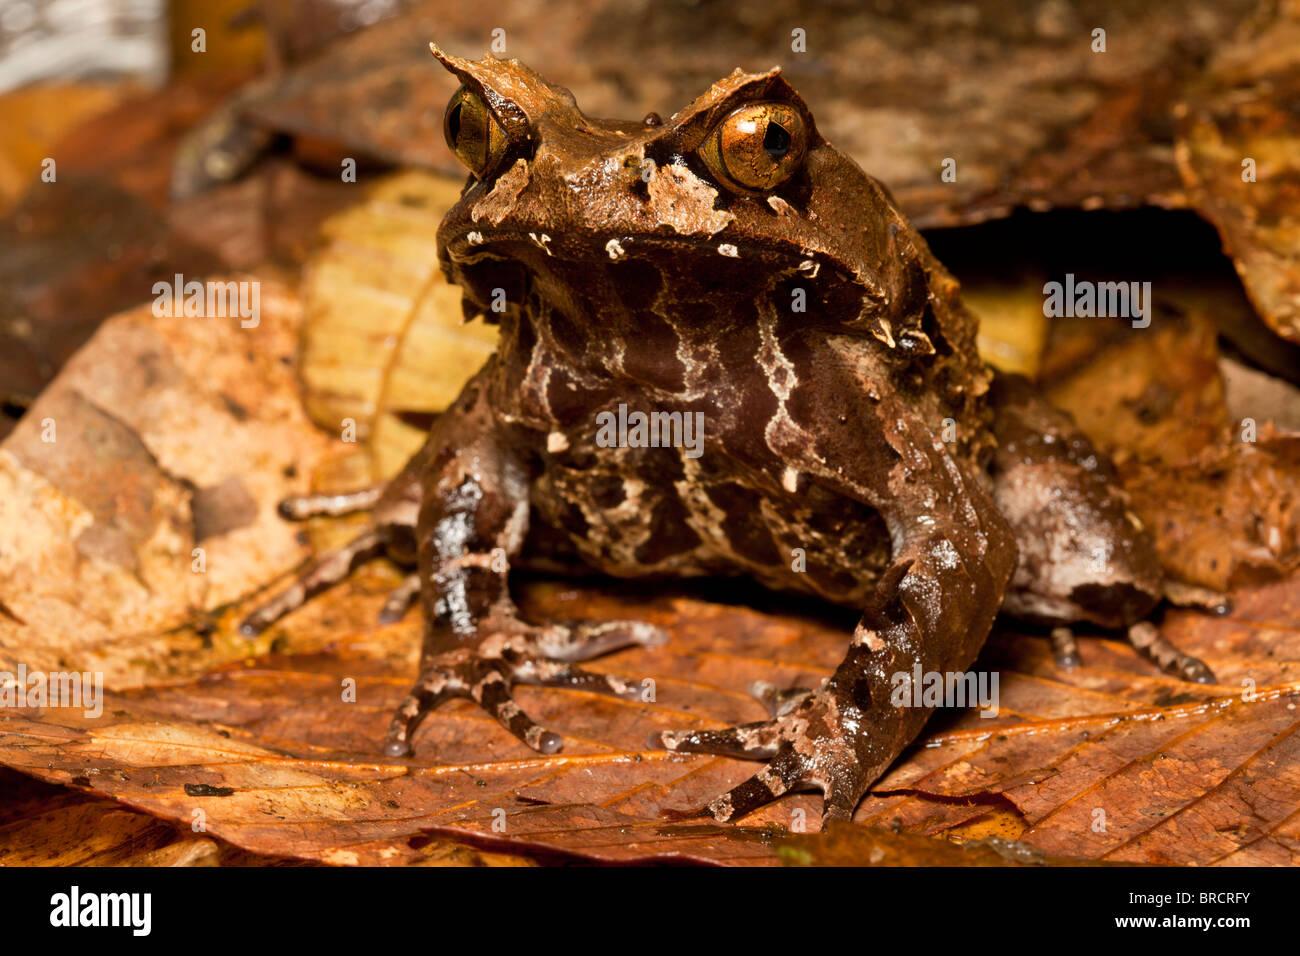 Montane gehörnten Frosch, Megophrys Kobayashii, Kinabalu National Park, Sabah, Borneo Stockbild